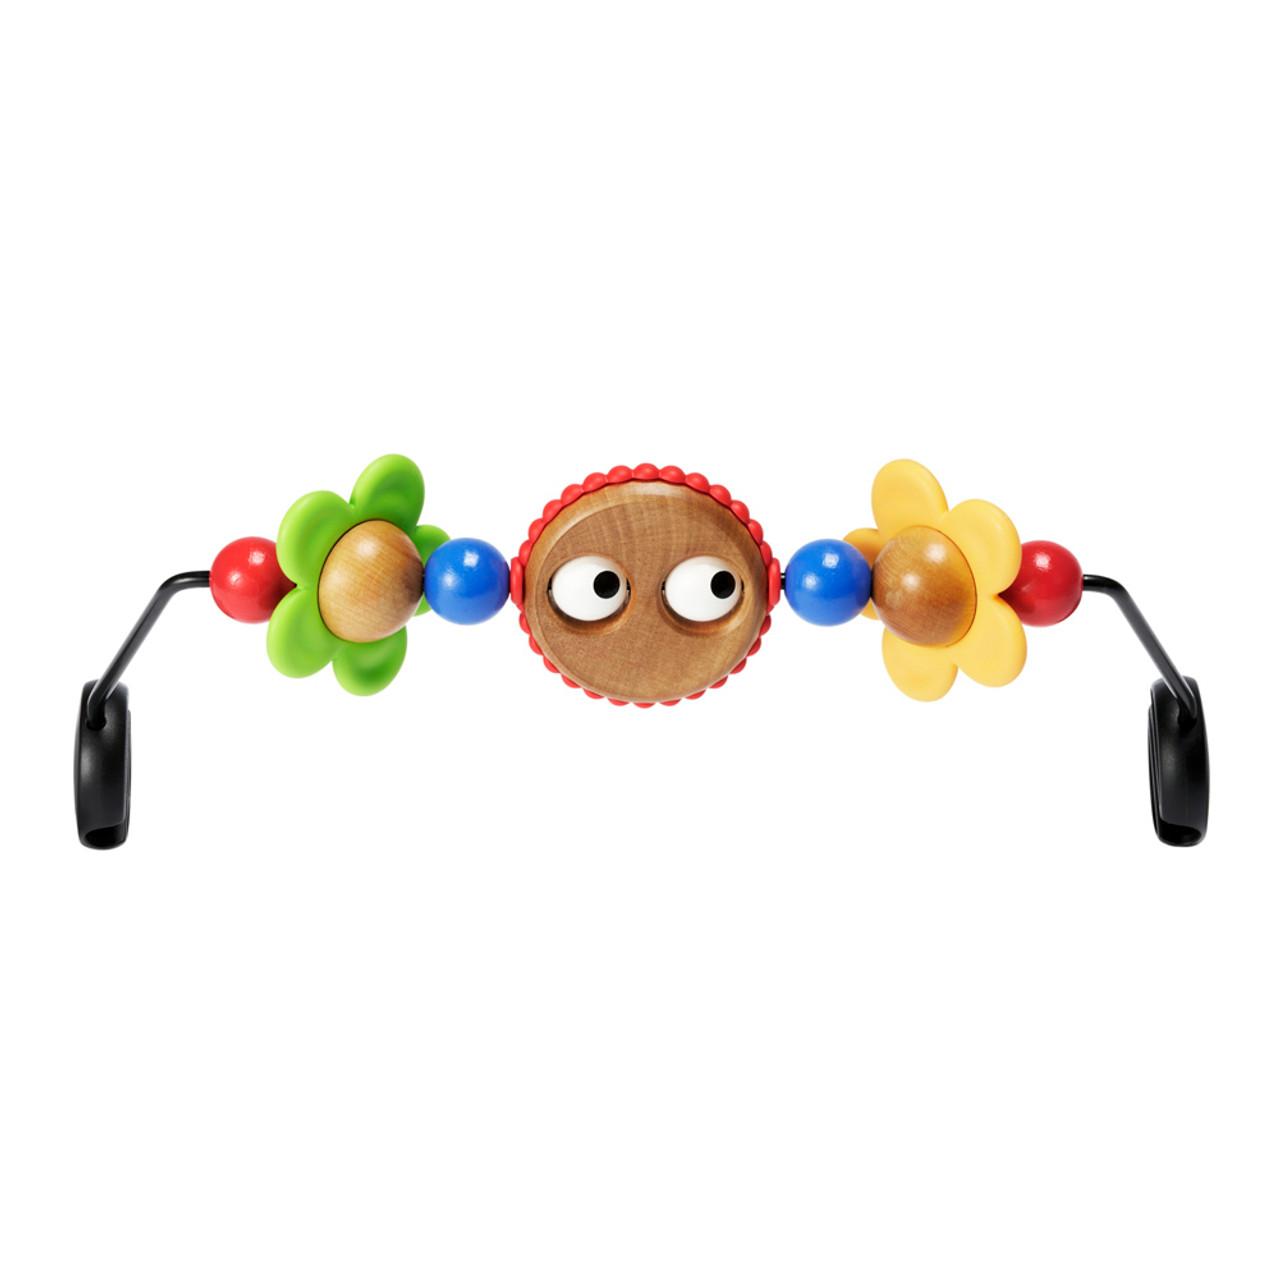 dba2ff5d915 BabyBjorn Googly Eyes Wooden Toy for Bouncers - Dear-Born Baby